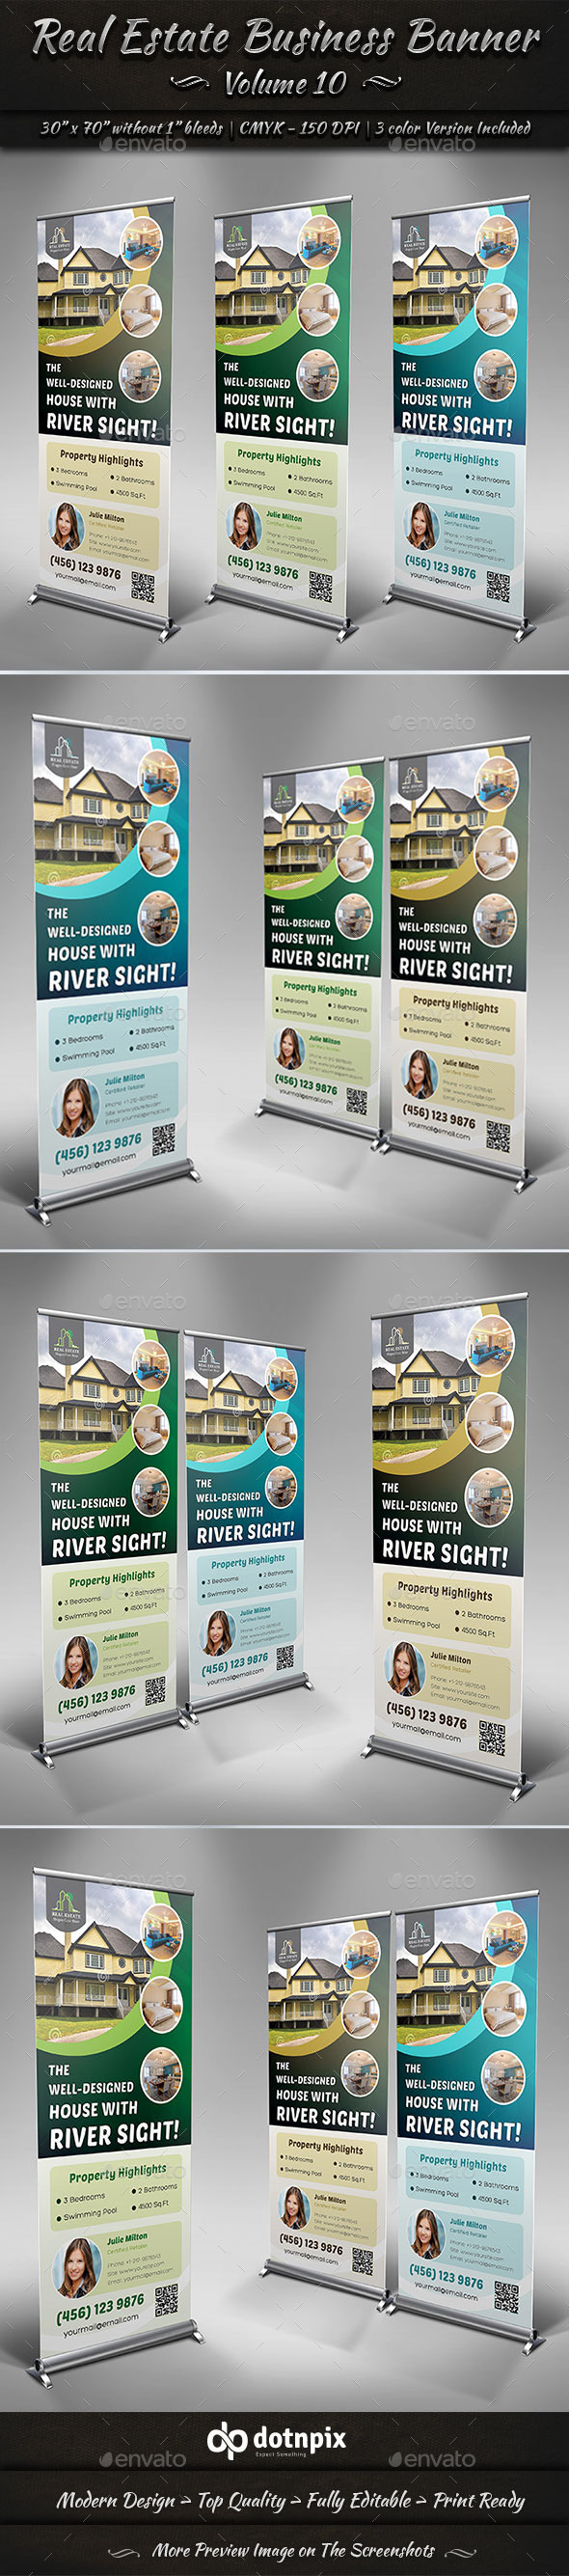 Real Estate Business Banner Volume 10